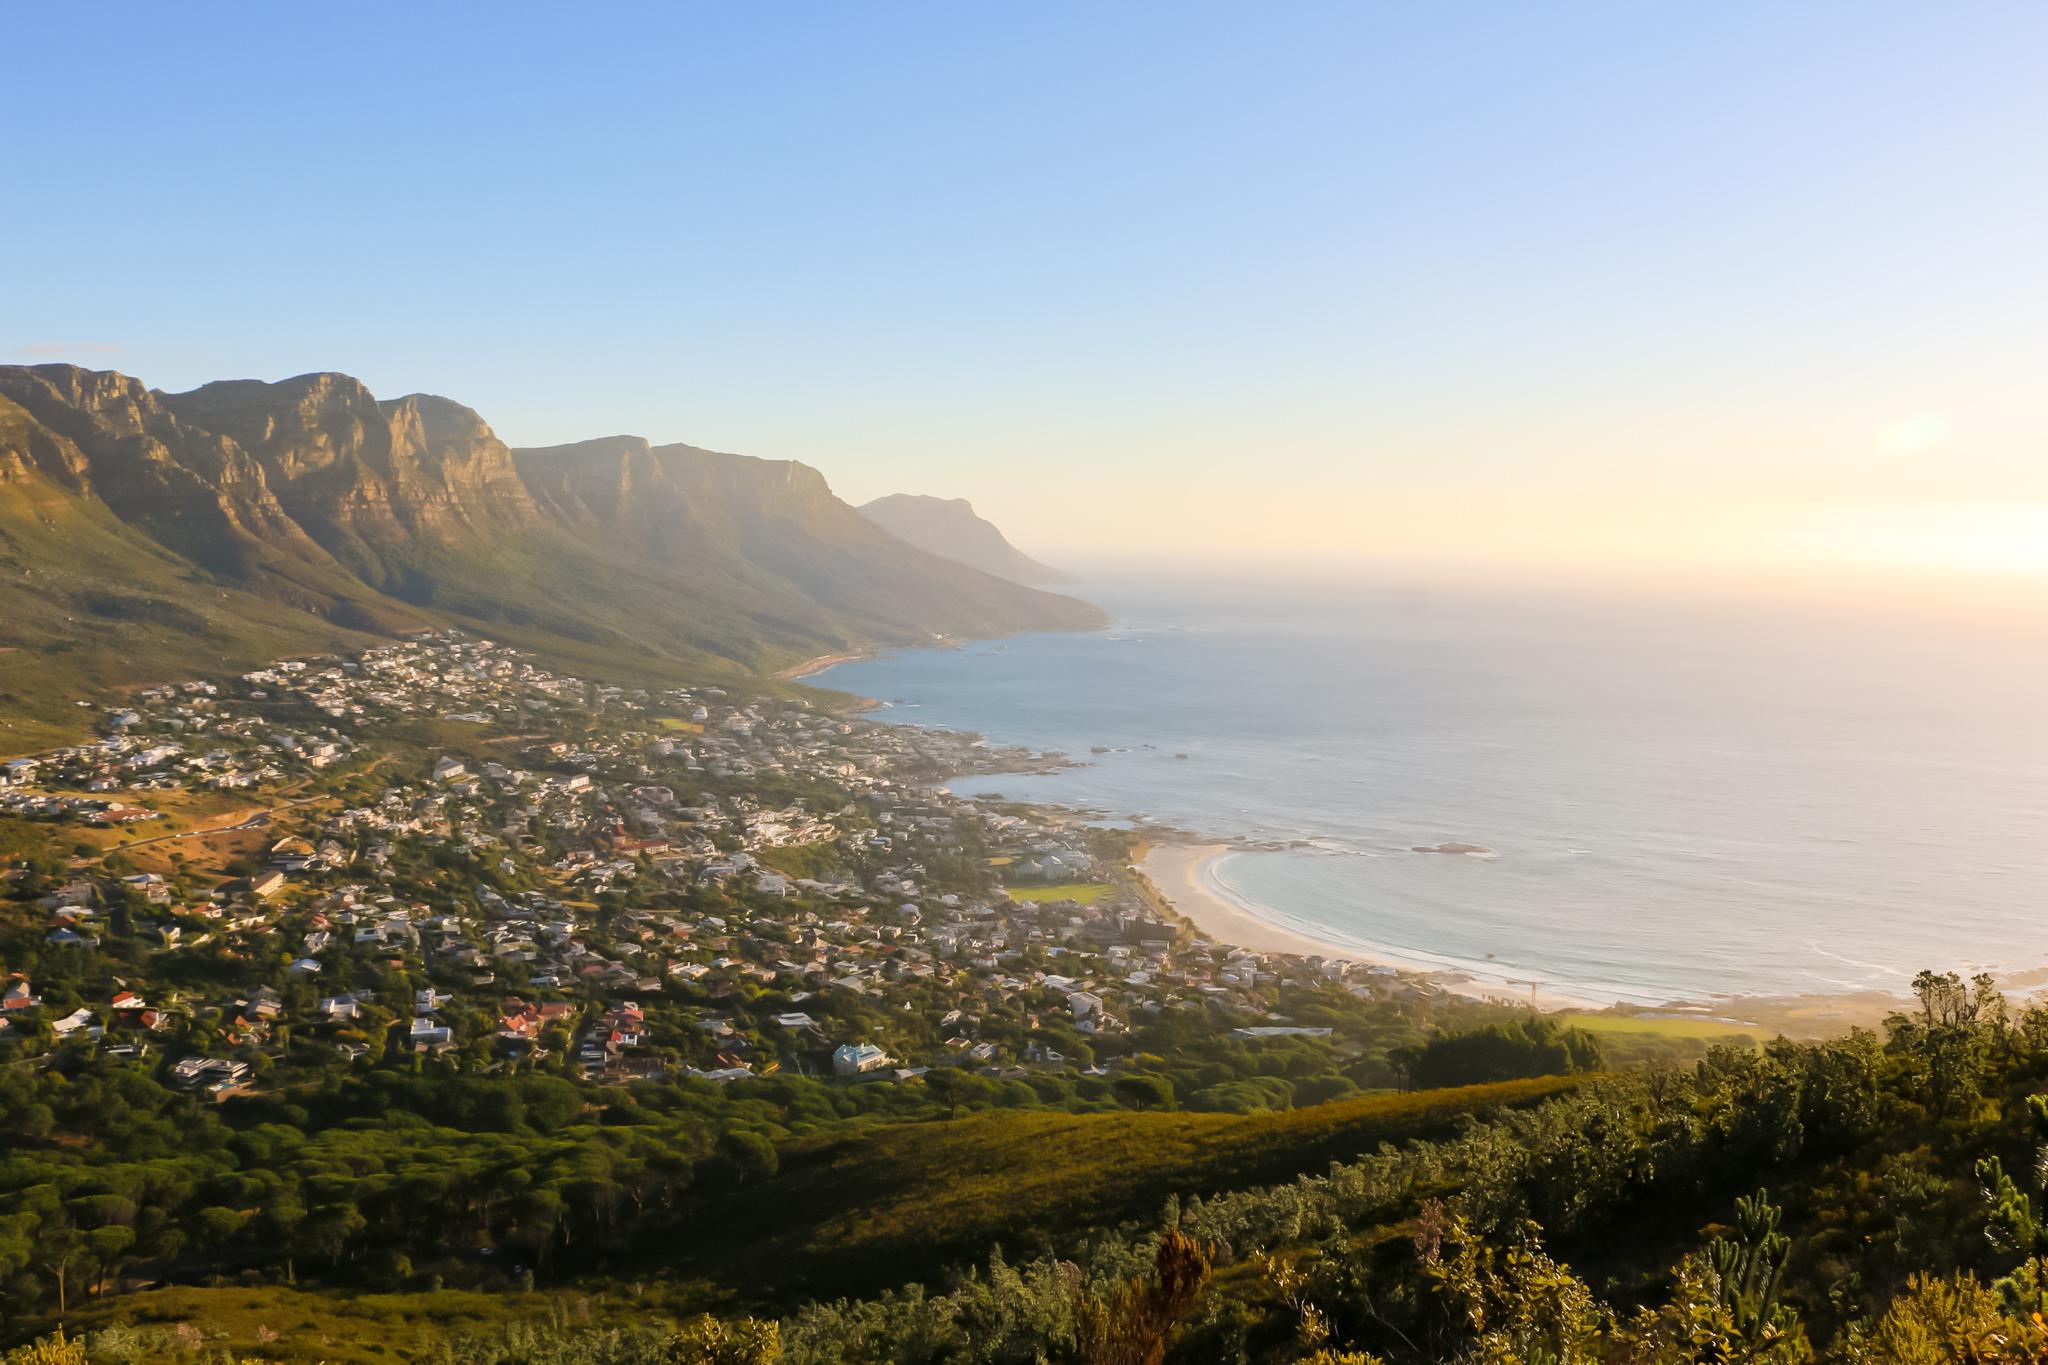 Neuer Lebensabschnitt: Kapstadt